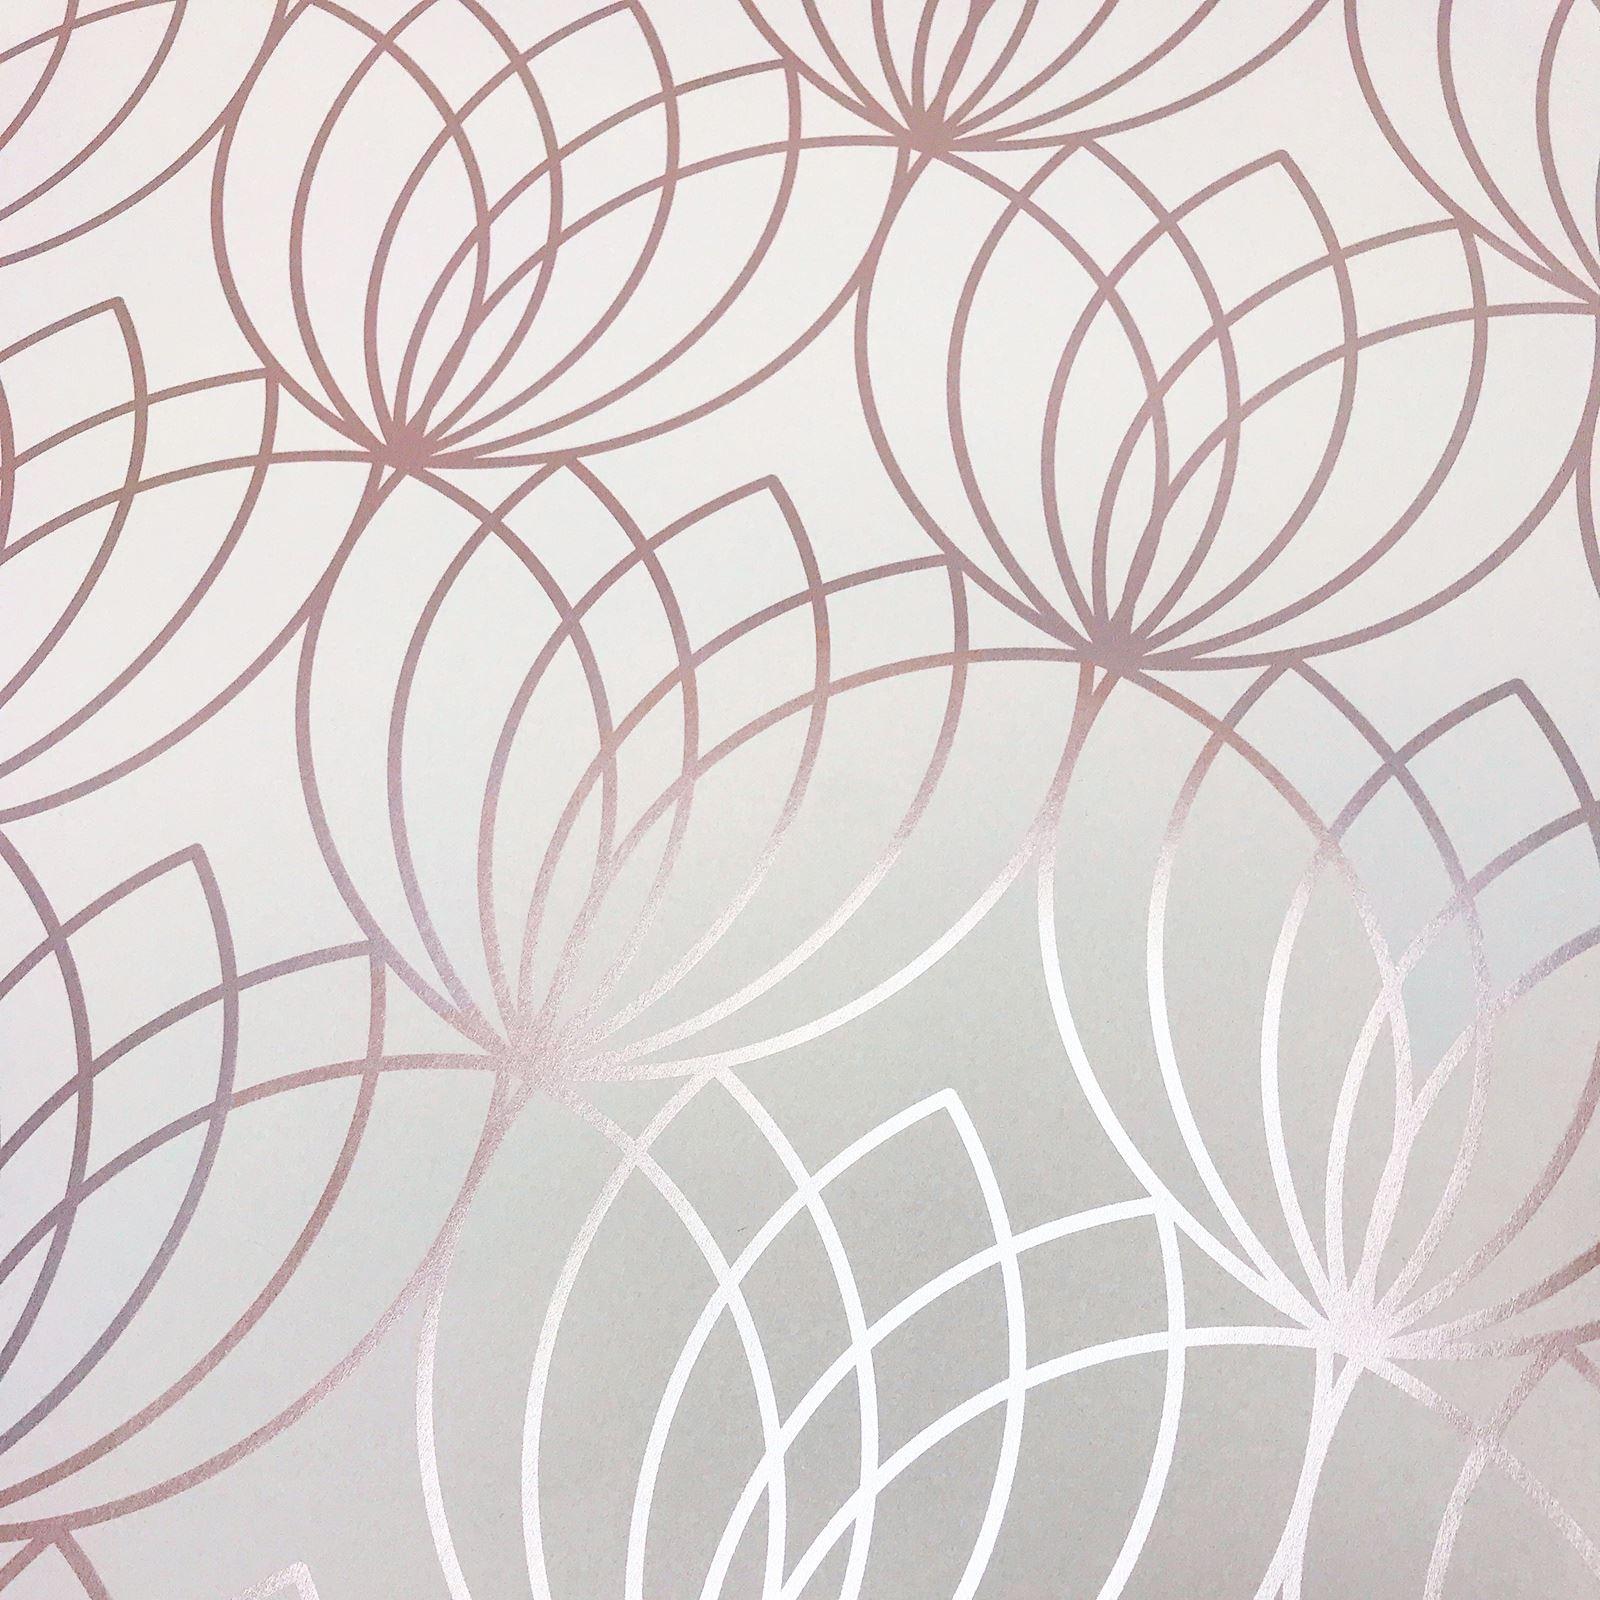 miniatura 93 - Carta da Parati Geometrica Arredamento Camera Moderno Vari Disegni e Colori